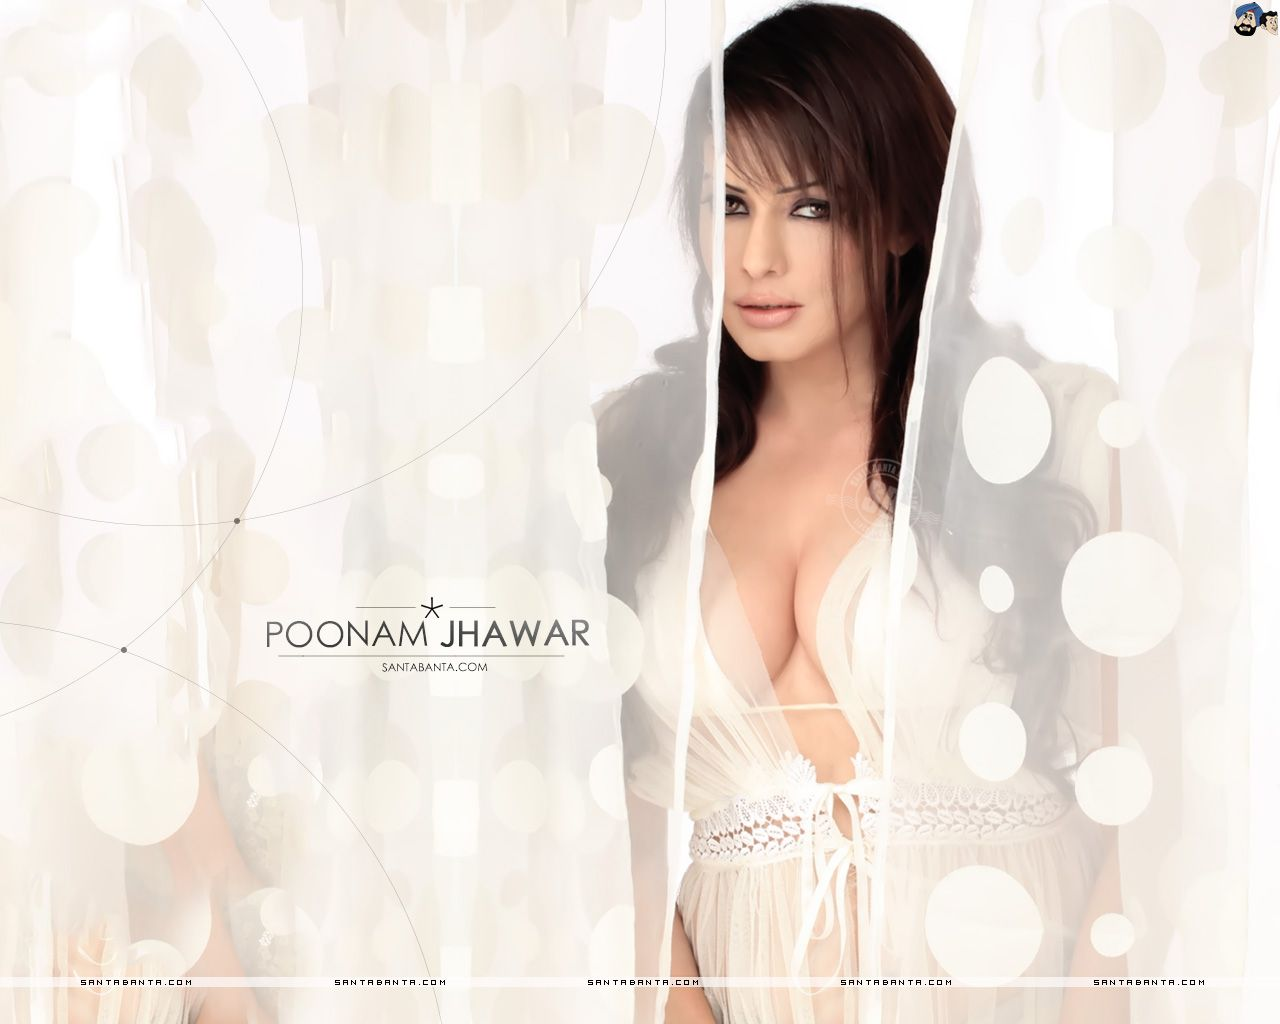 Poonam Jhawer Wallpapers